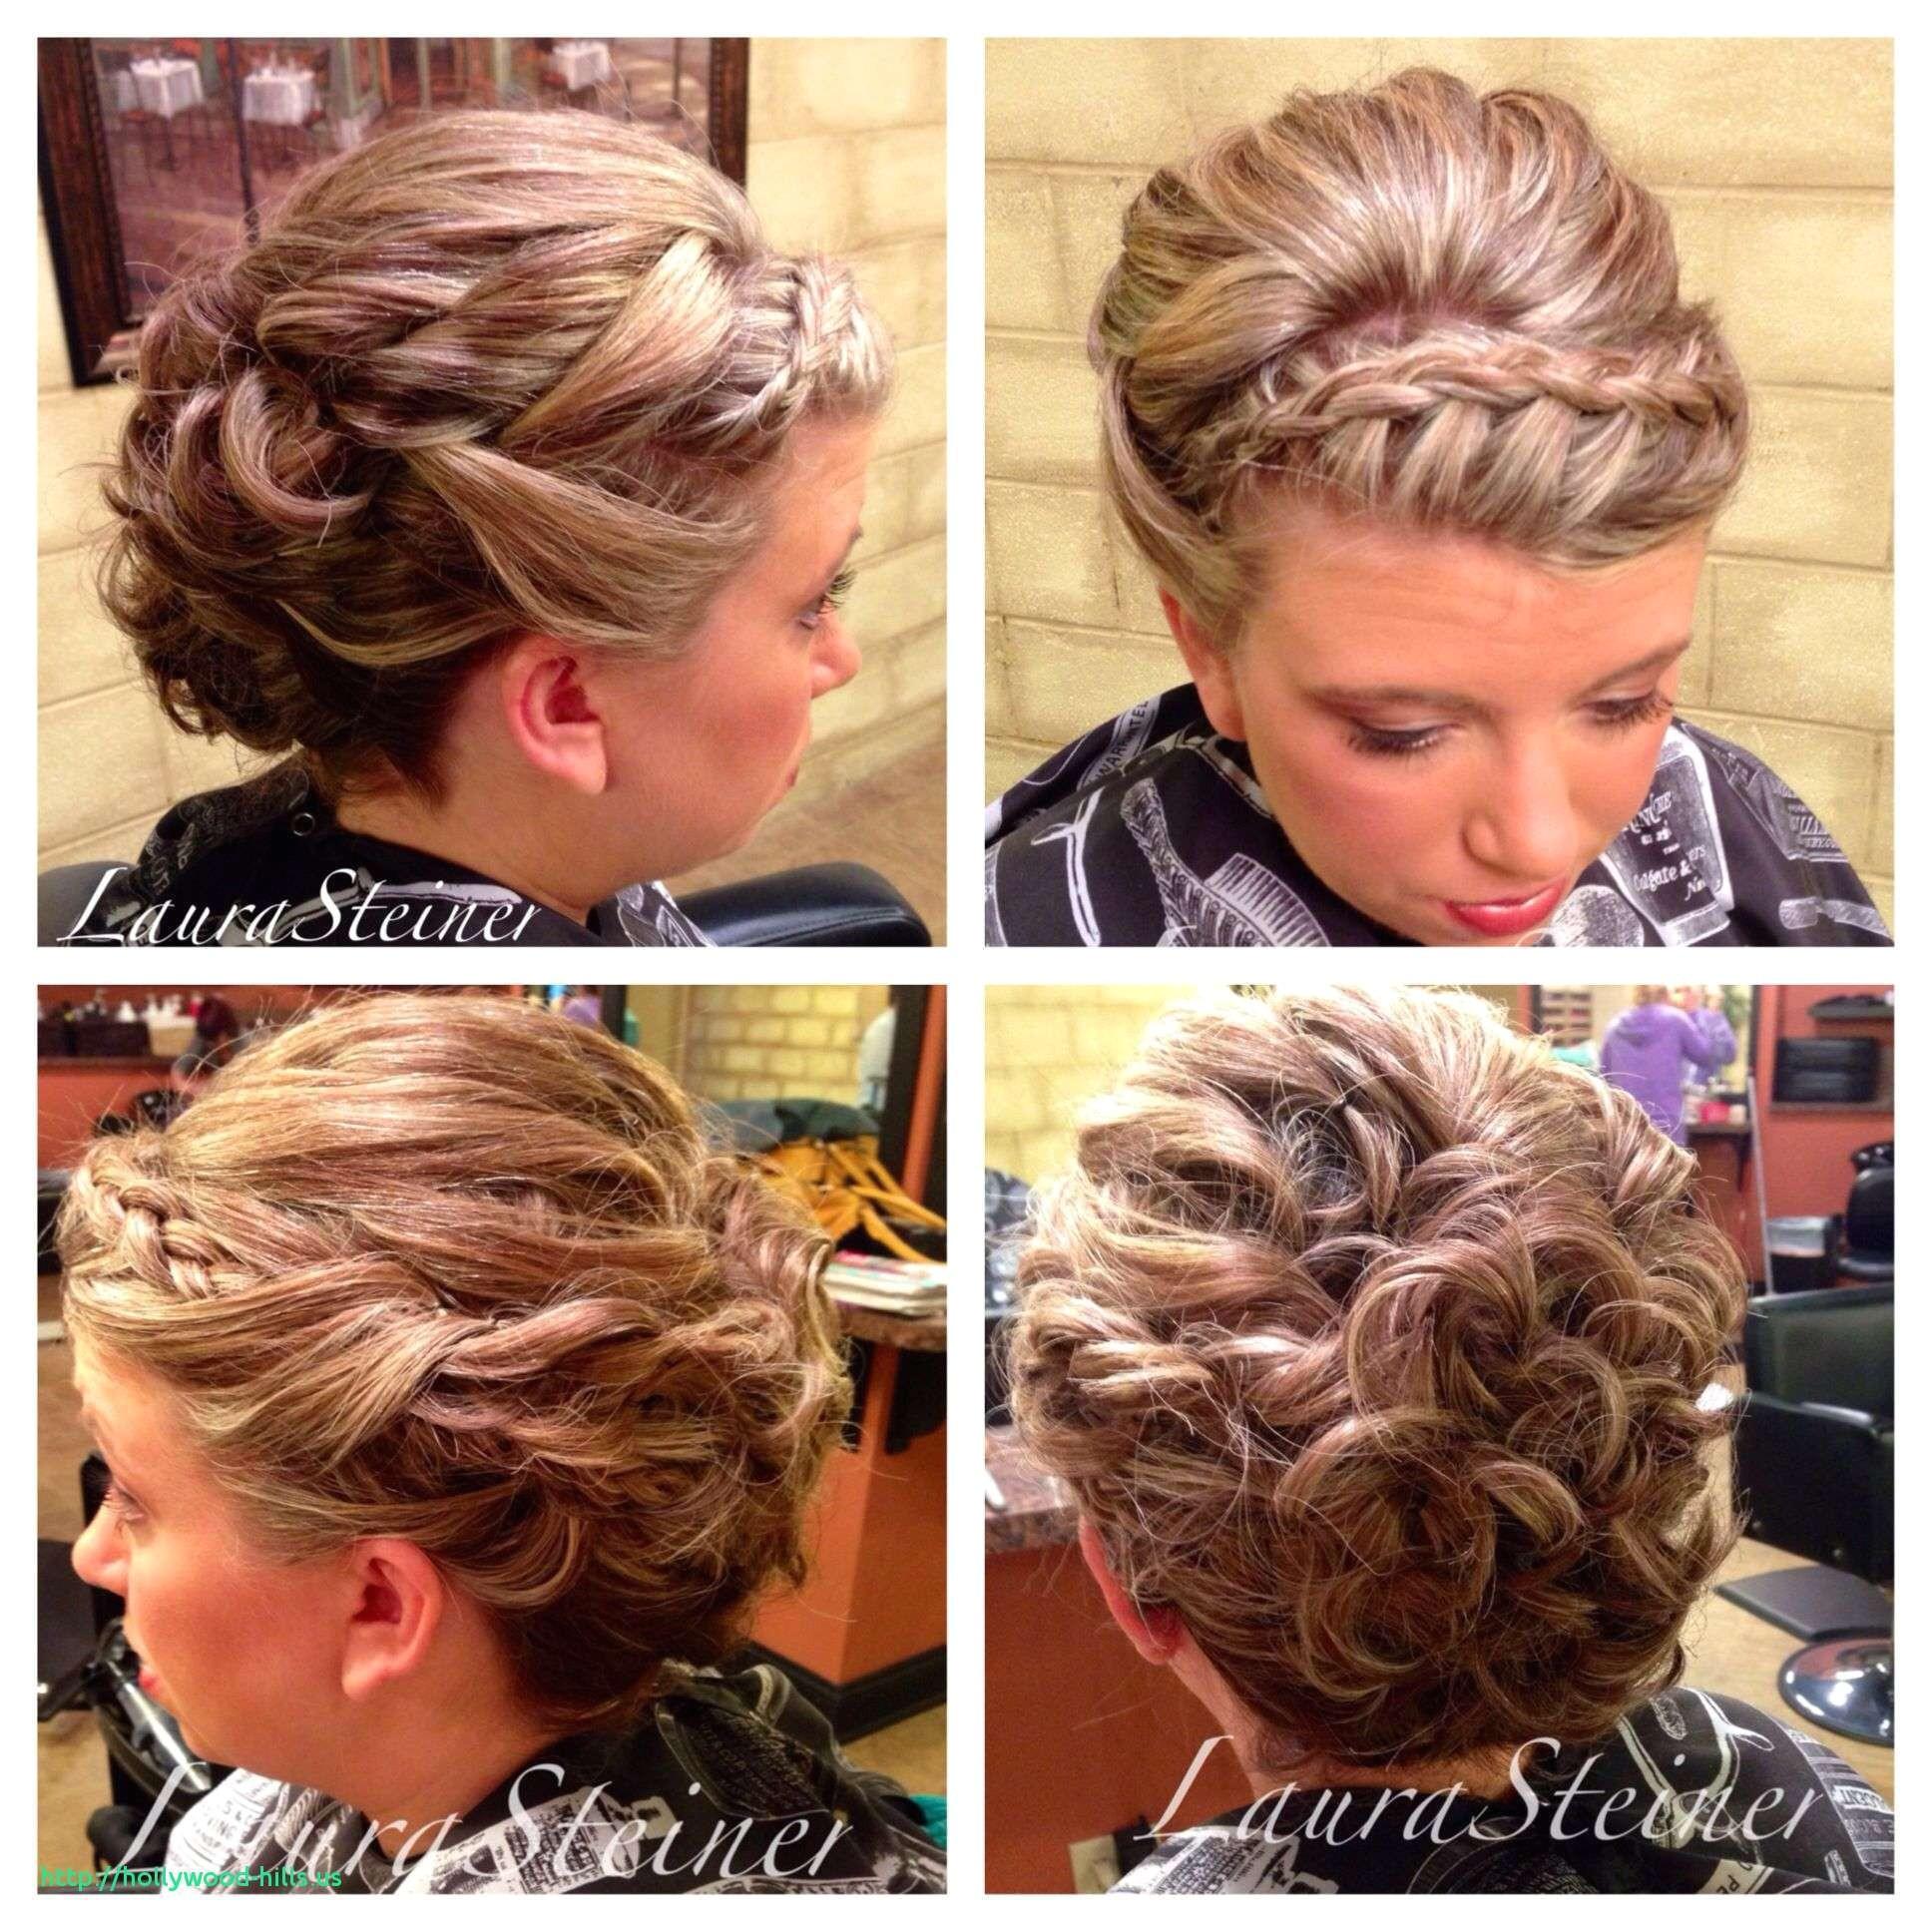 1950s Hairstyles for Long Hair Beautiful Elegant evening Hairstyles for Long Hair Awesome Haircuts 0d